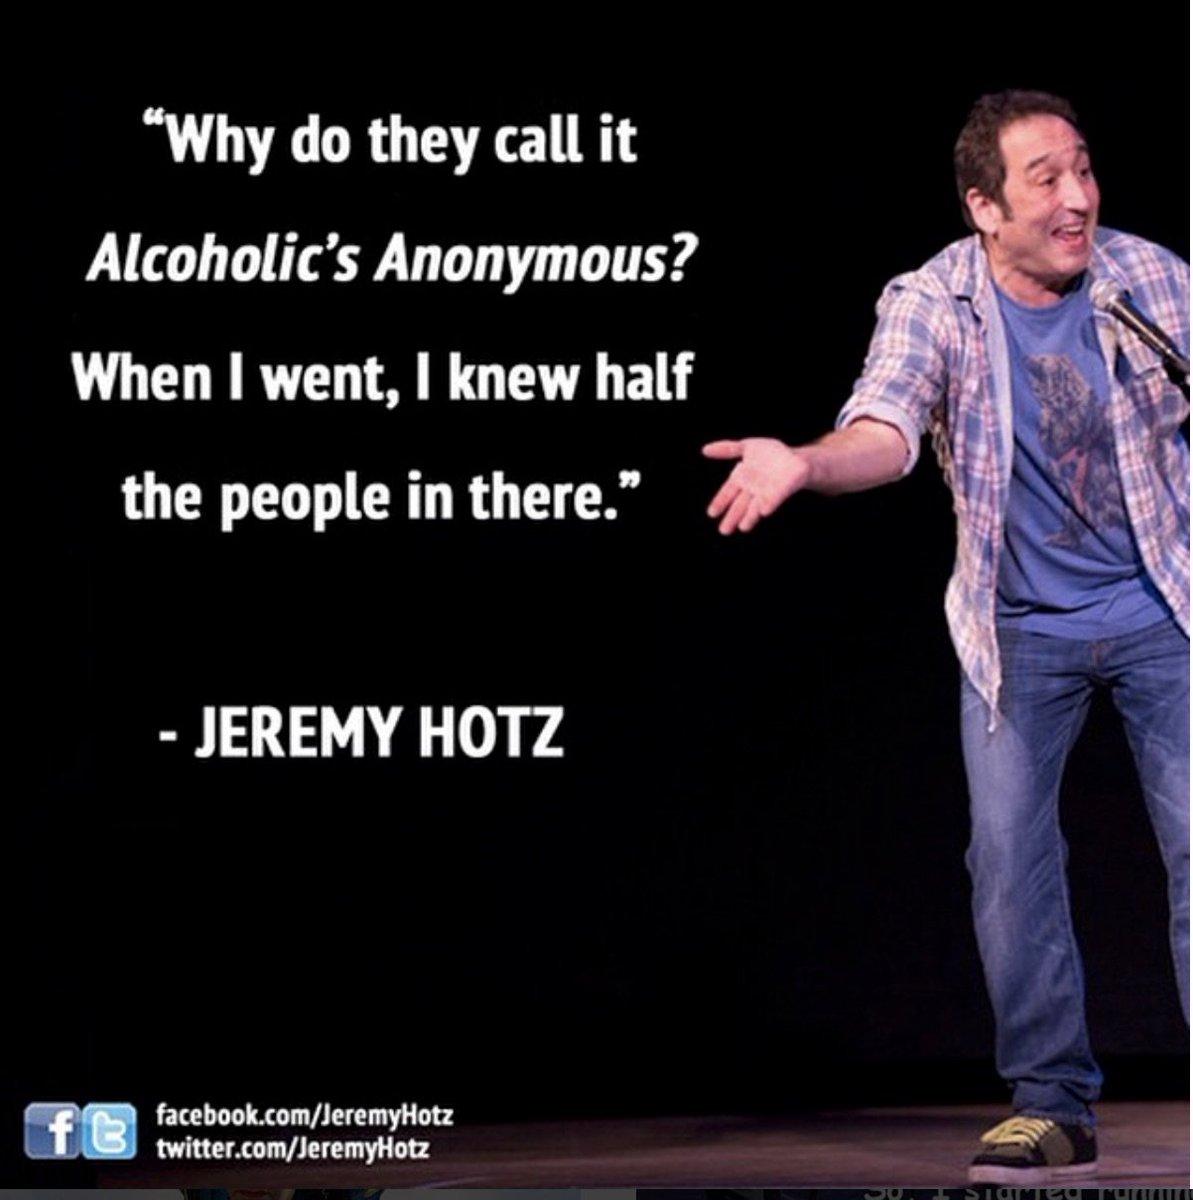 Jeremy Hotz on Twitter: